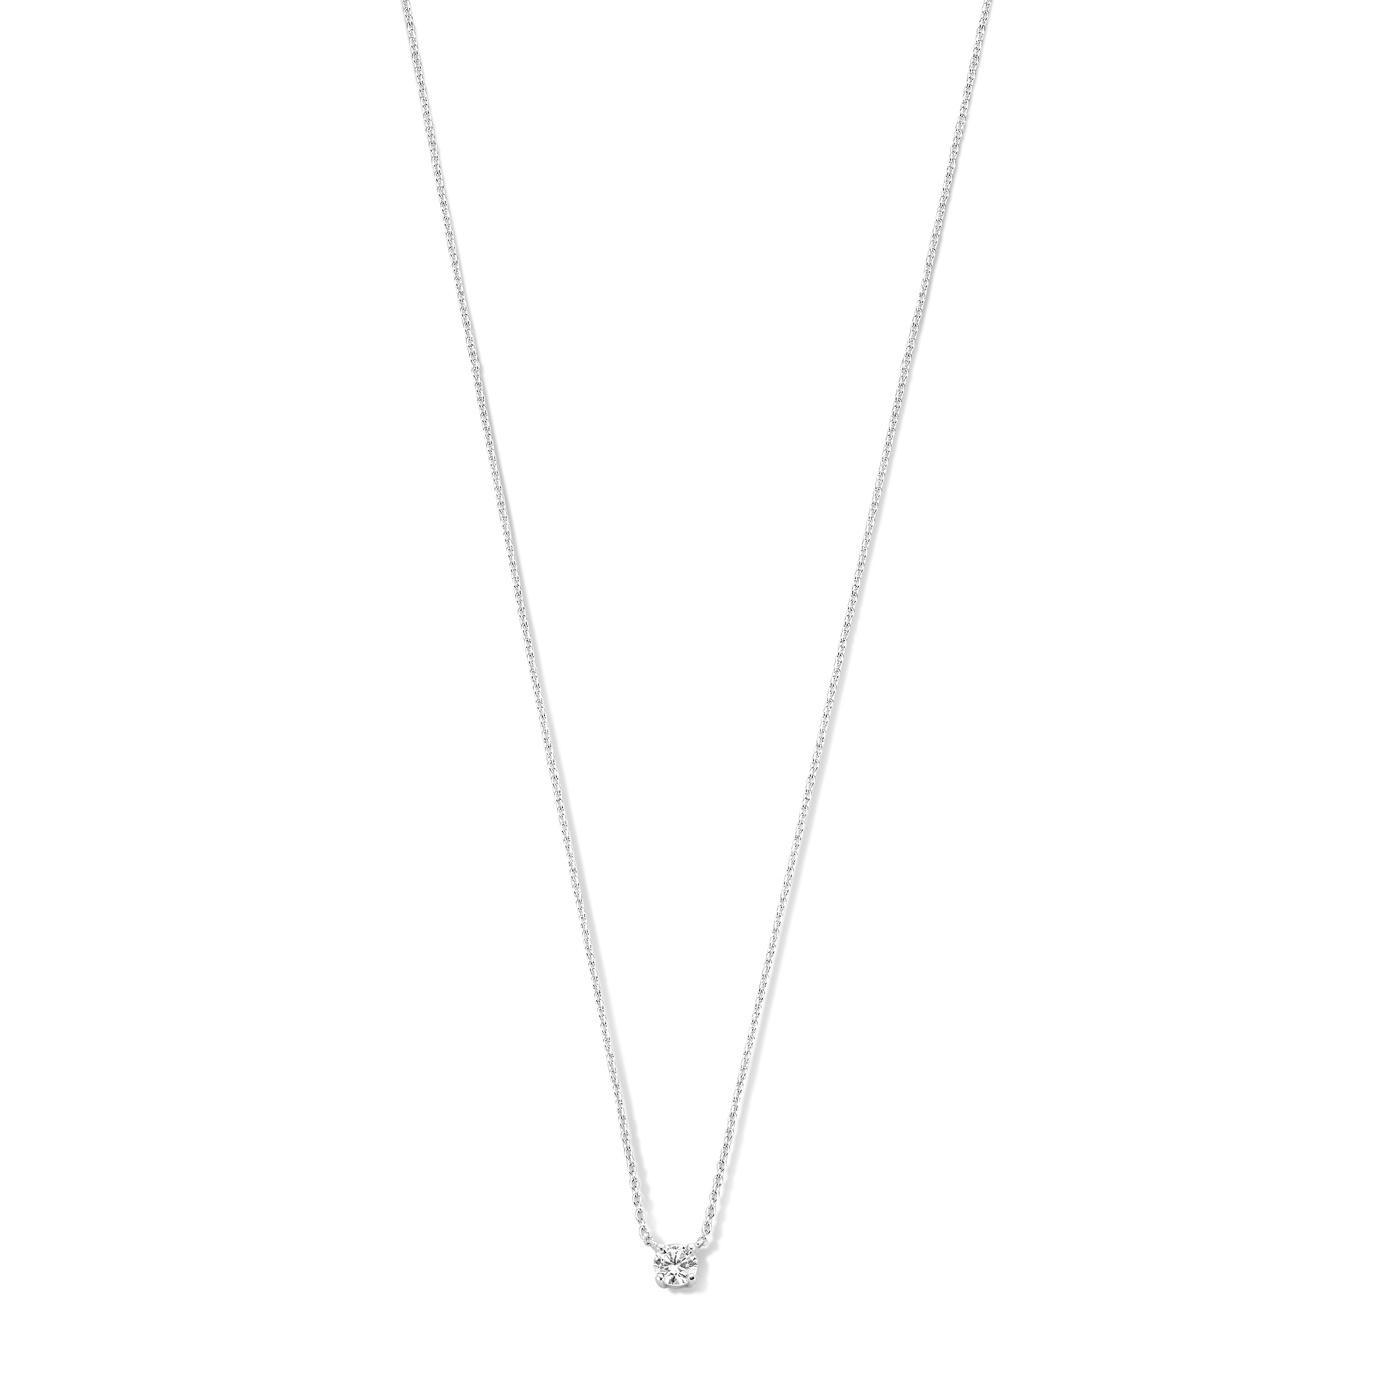 Isabel Bernard Saint Germain Hélione 14 karat white gold necklace with zirconia